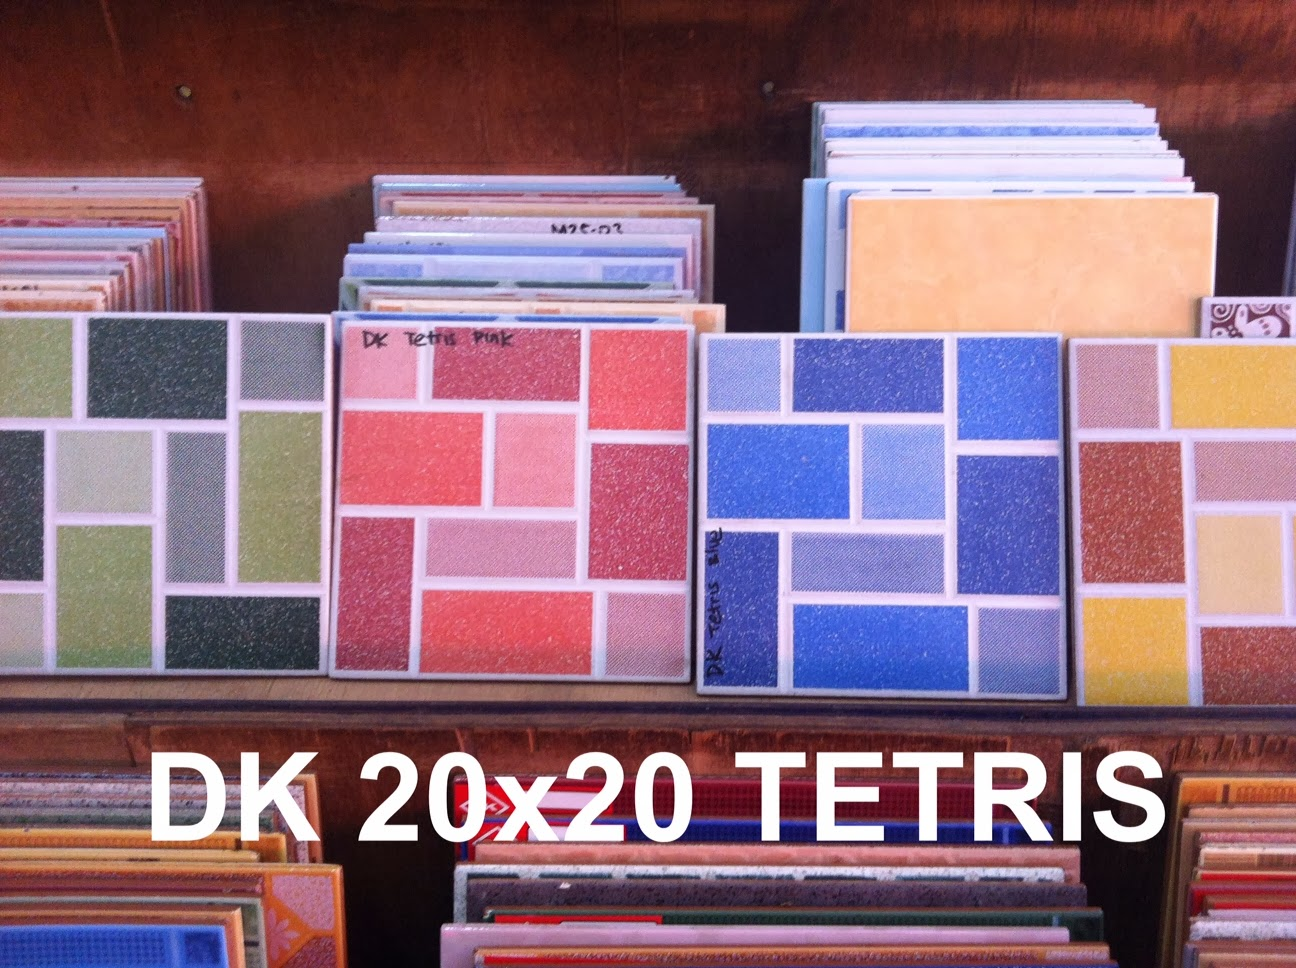 DK 20x20 Tetris